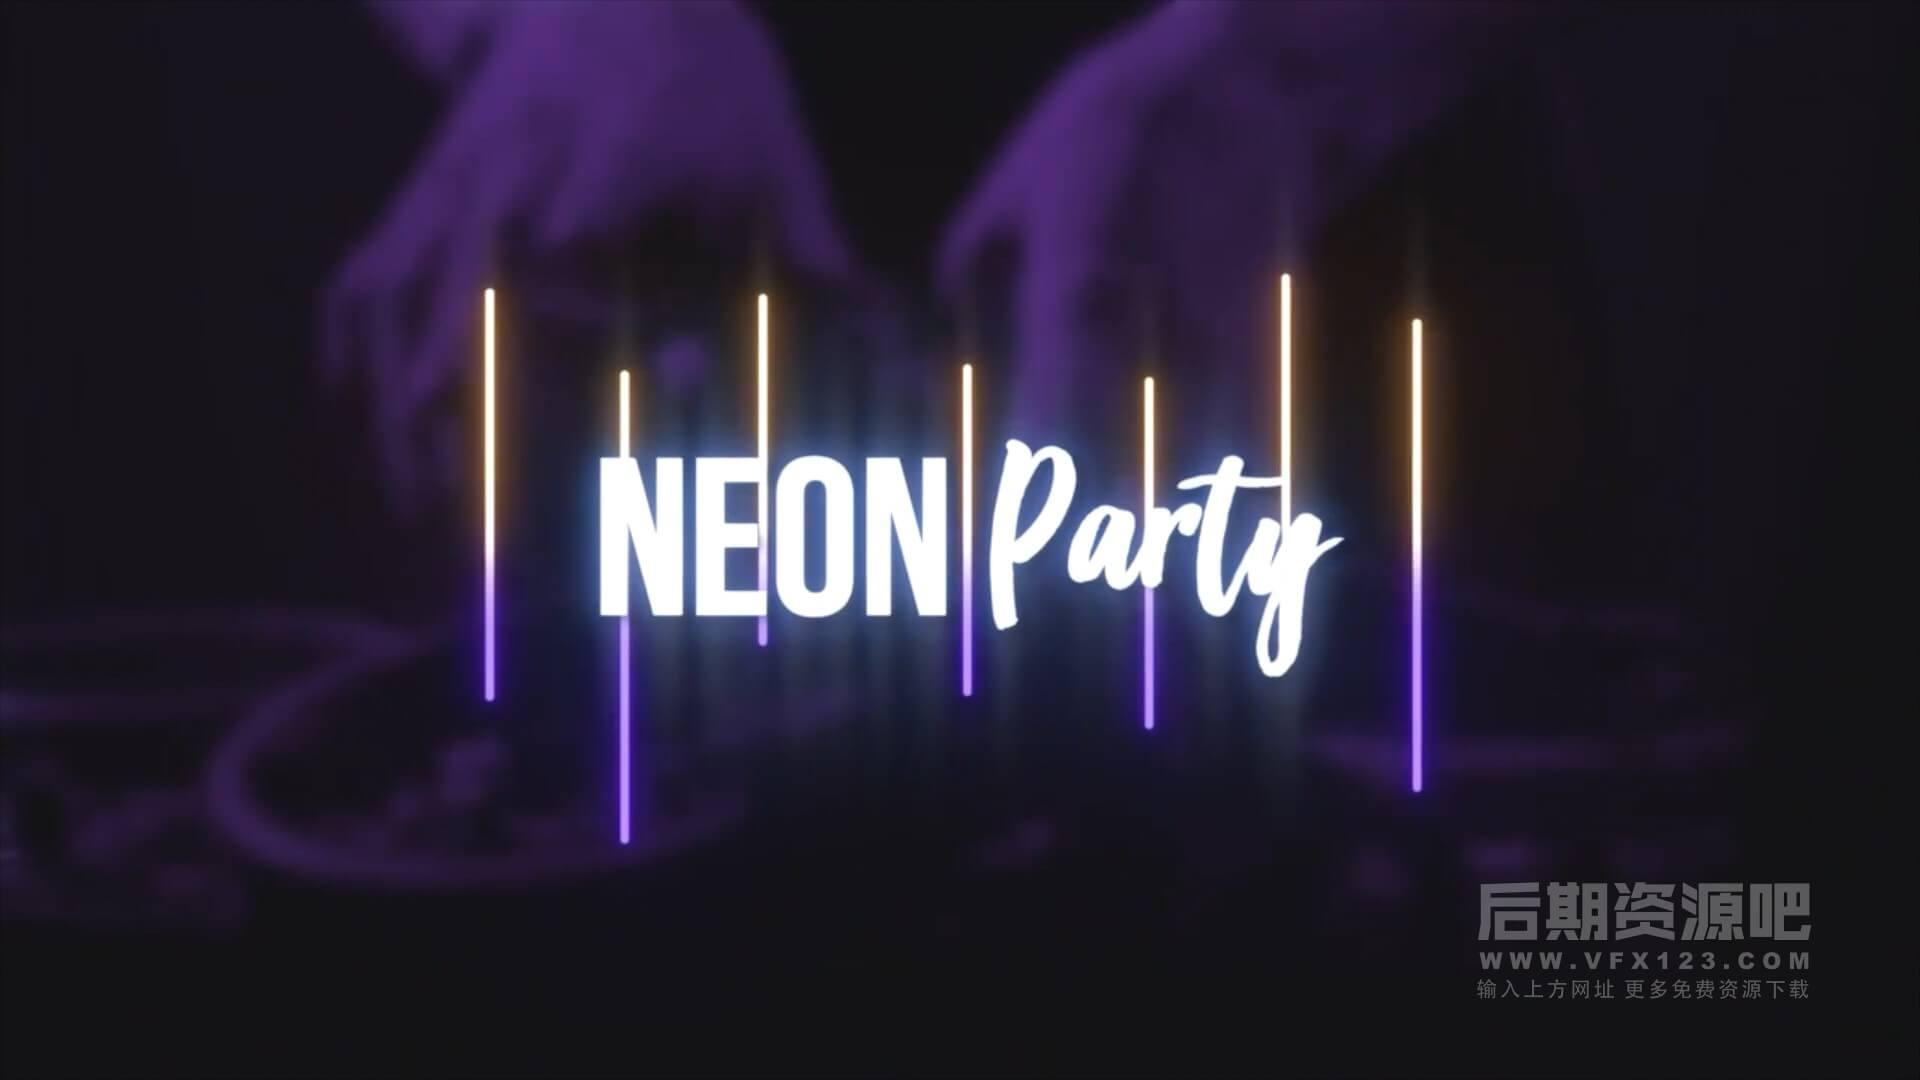 fcpx插件 霓虹灯标题制作工具包 简单易用 Neon Titles Toolkit